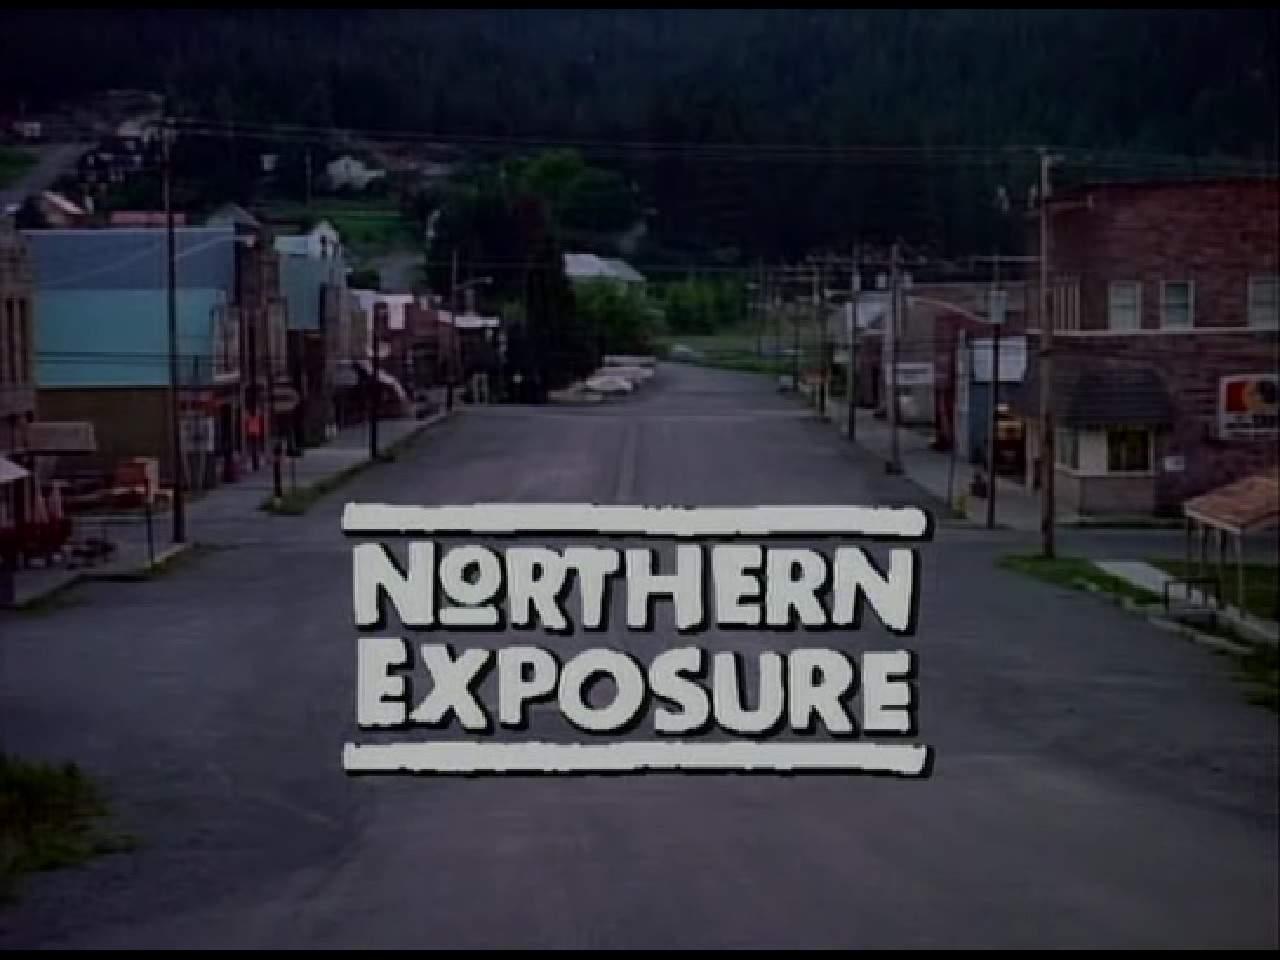 01 - Northern Exposure